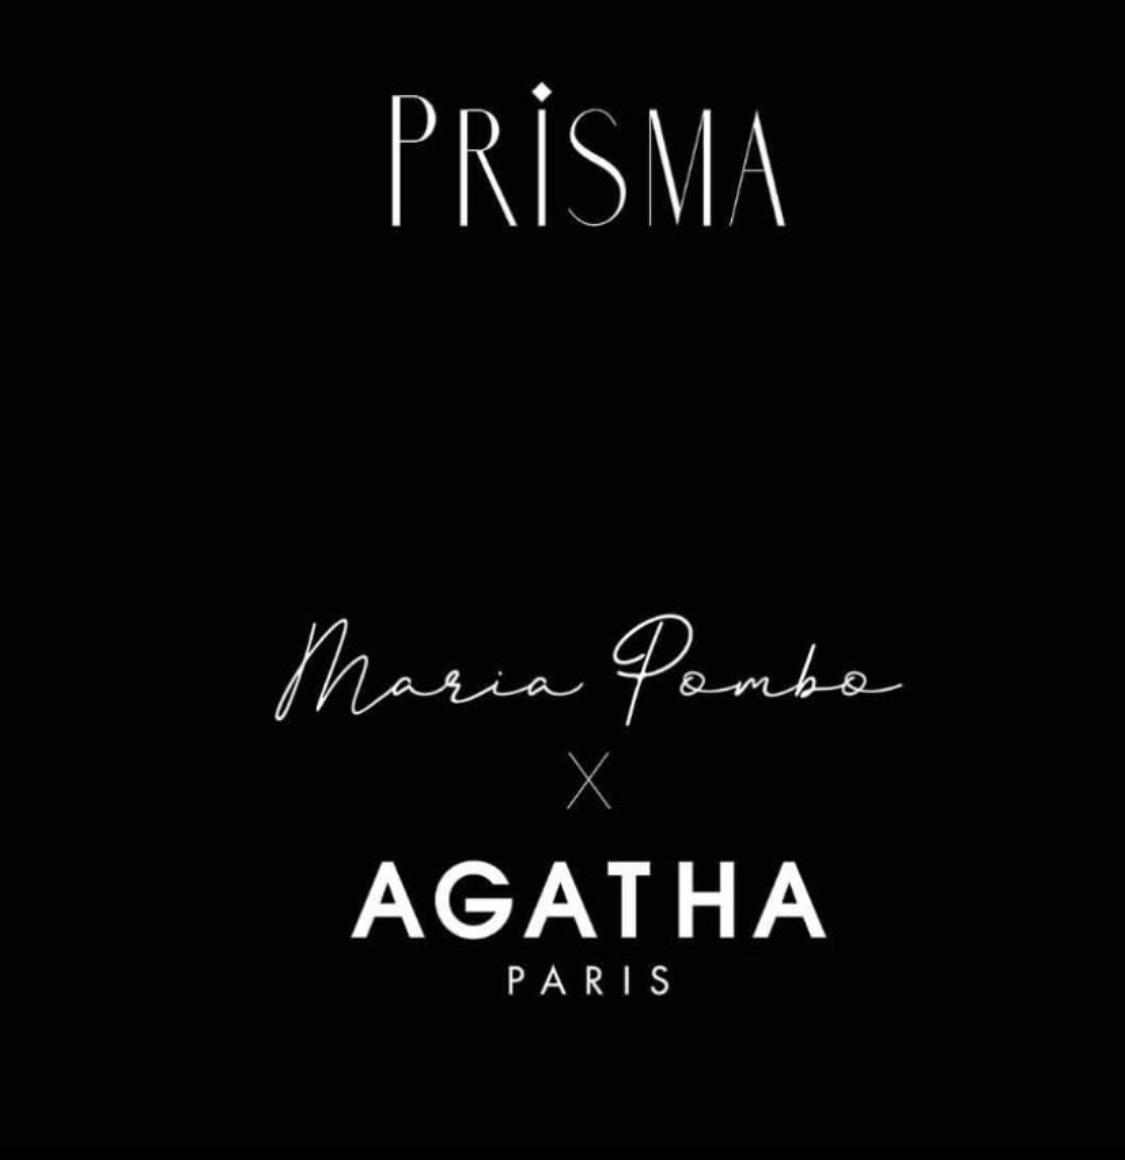 María Pombo Agatha Paris